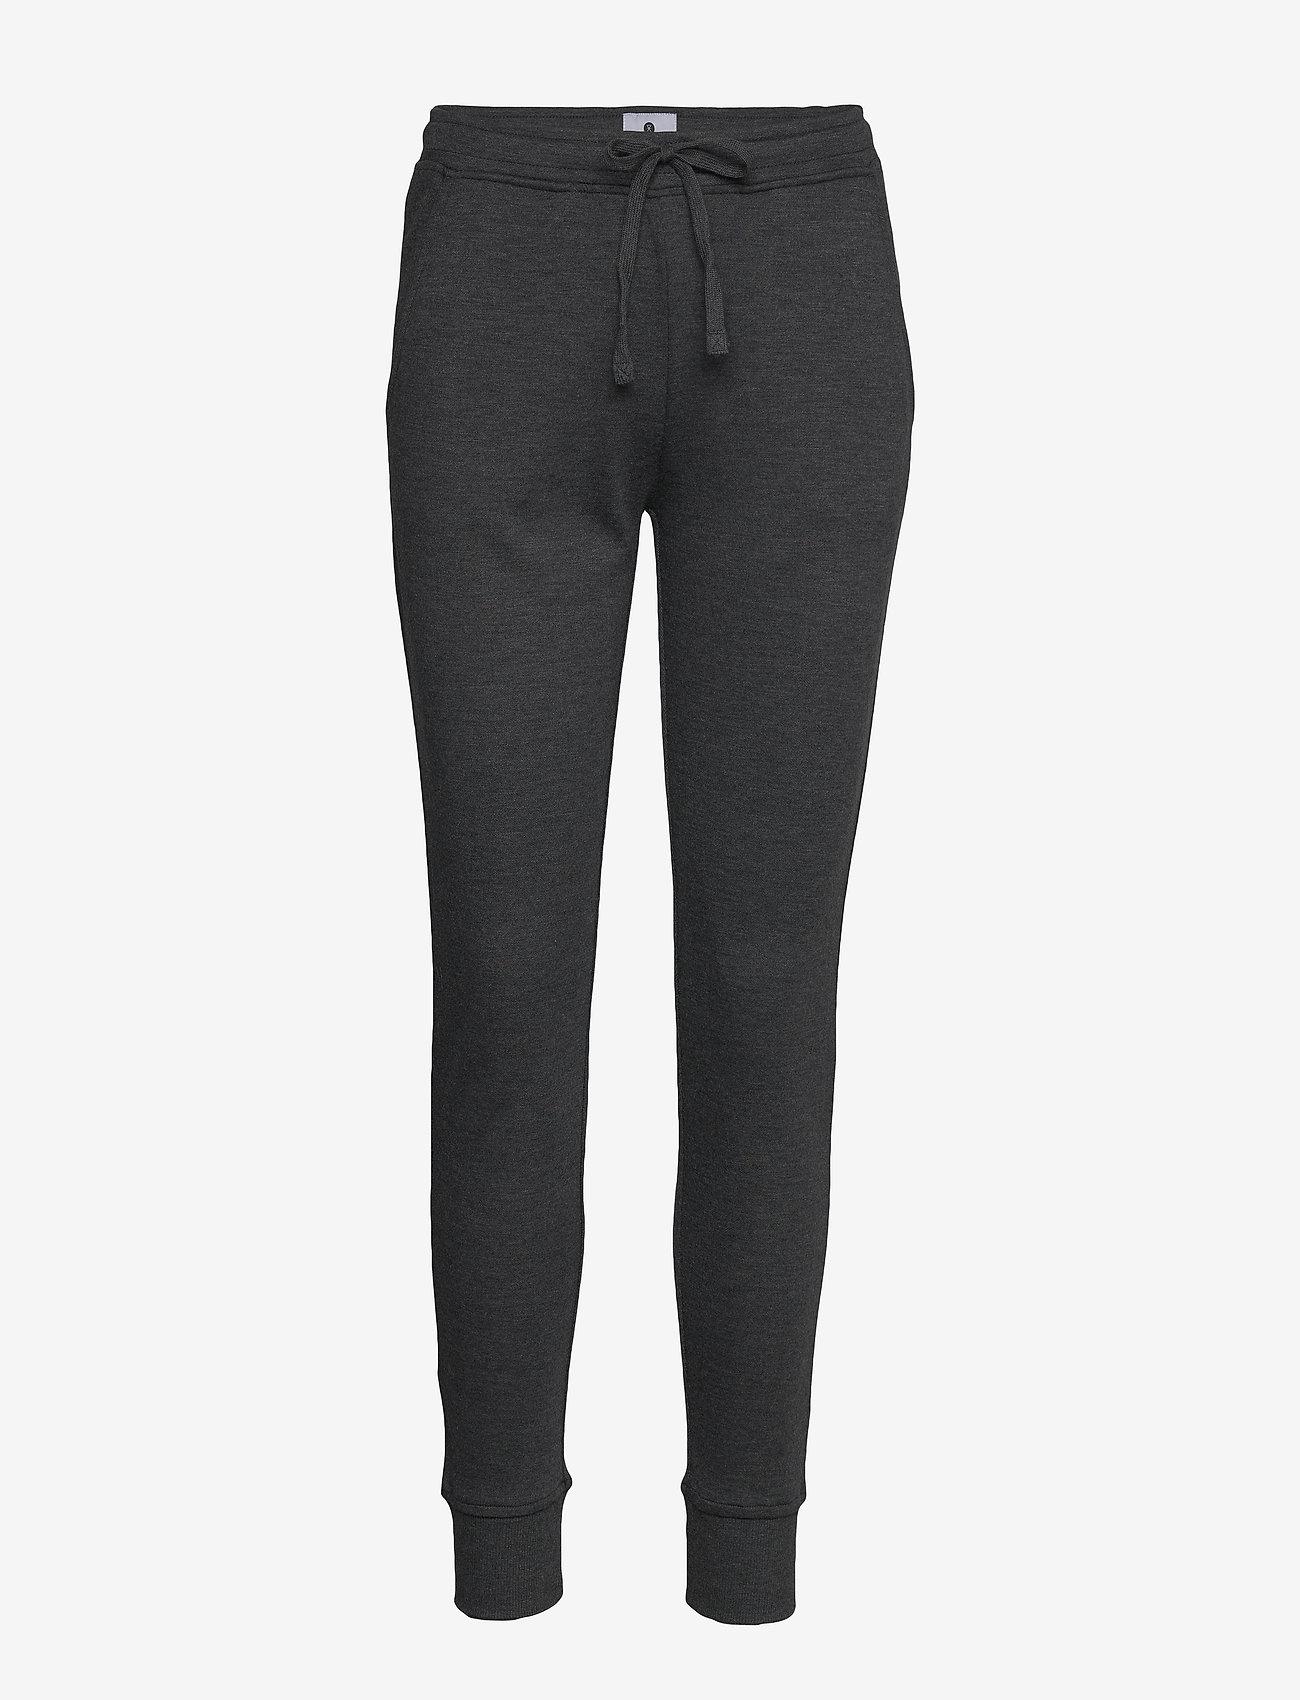 JBS of Denmark - JBS of Denmark sweat pants bam - sweatpants - dark gray - 0